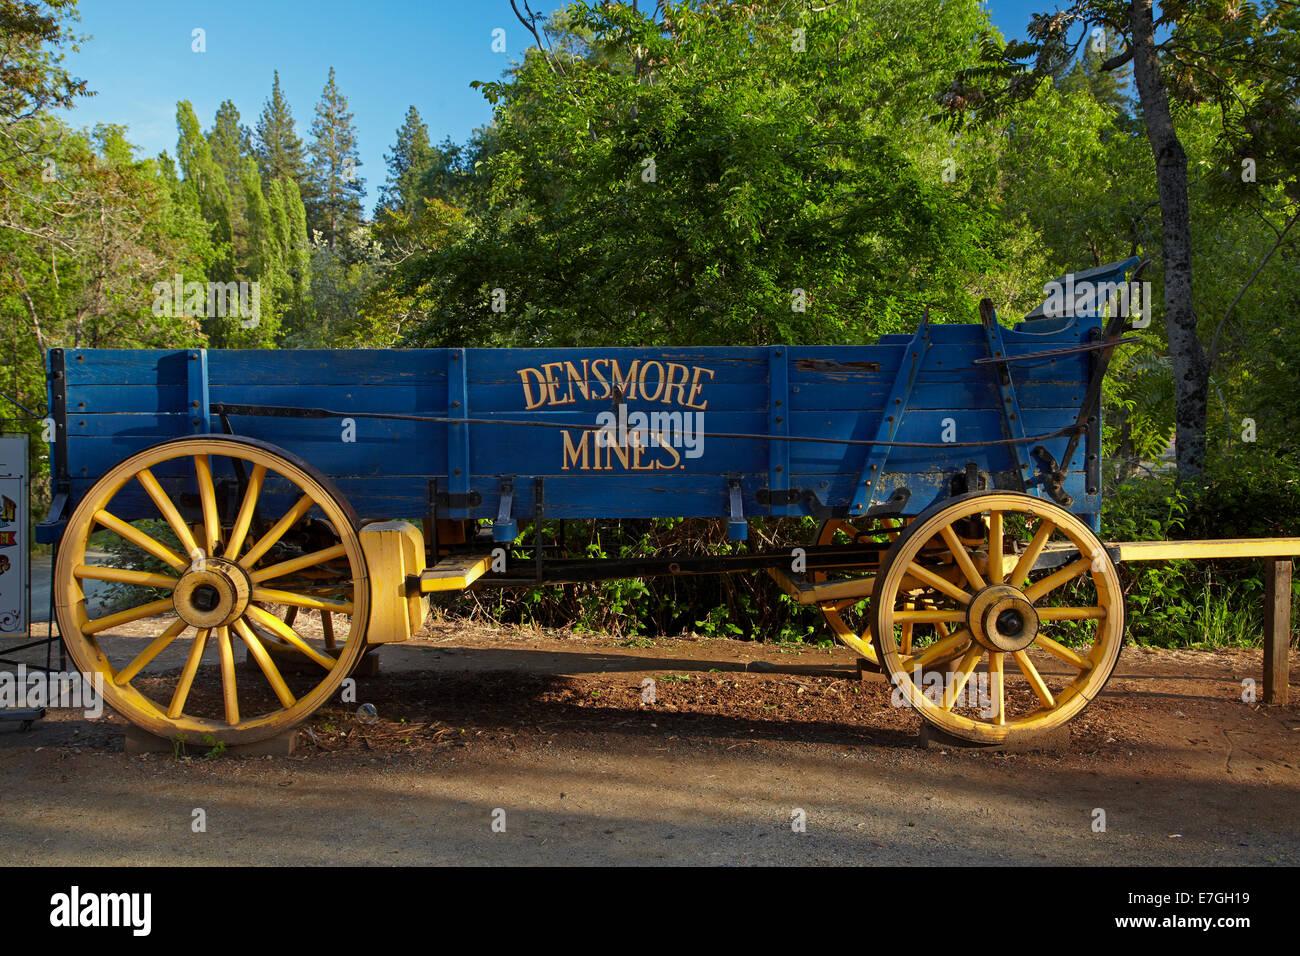 Densmore Mines Wagon, Main Street, Columbia State Historic Park, Columbia, Tuolumne County, Sierra Nevada foothills, - Stock Image